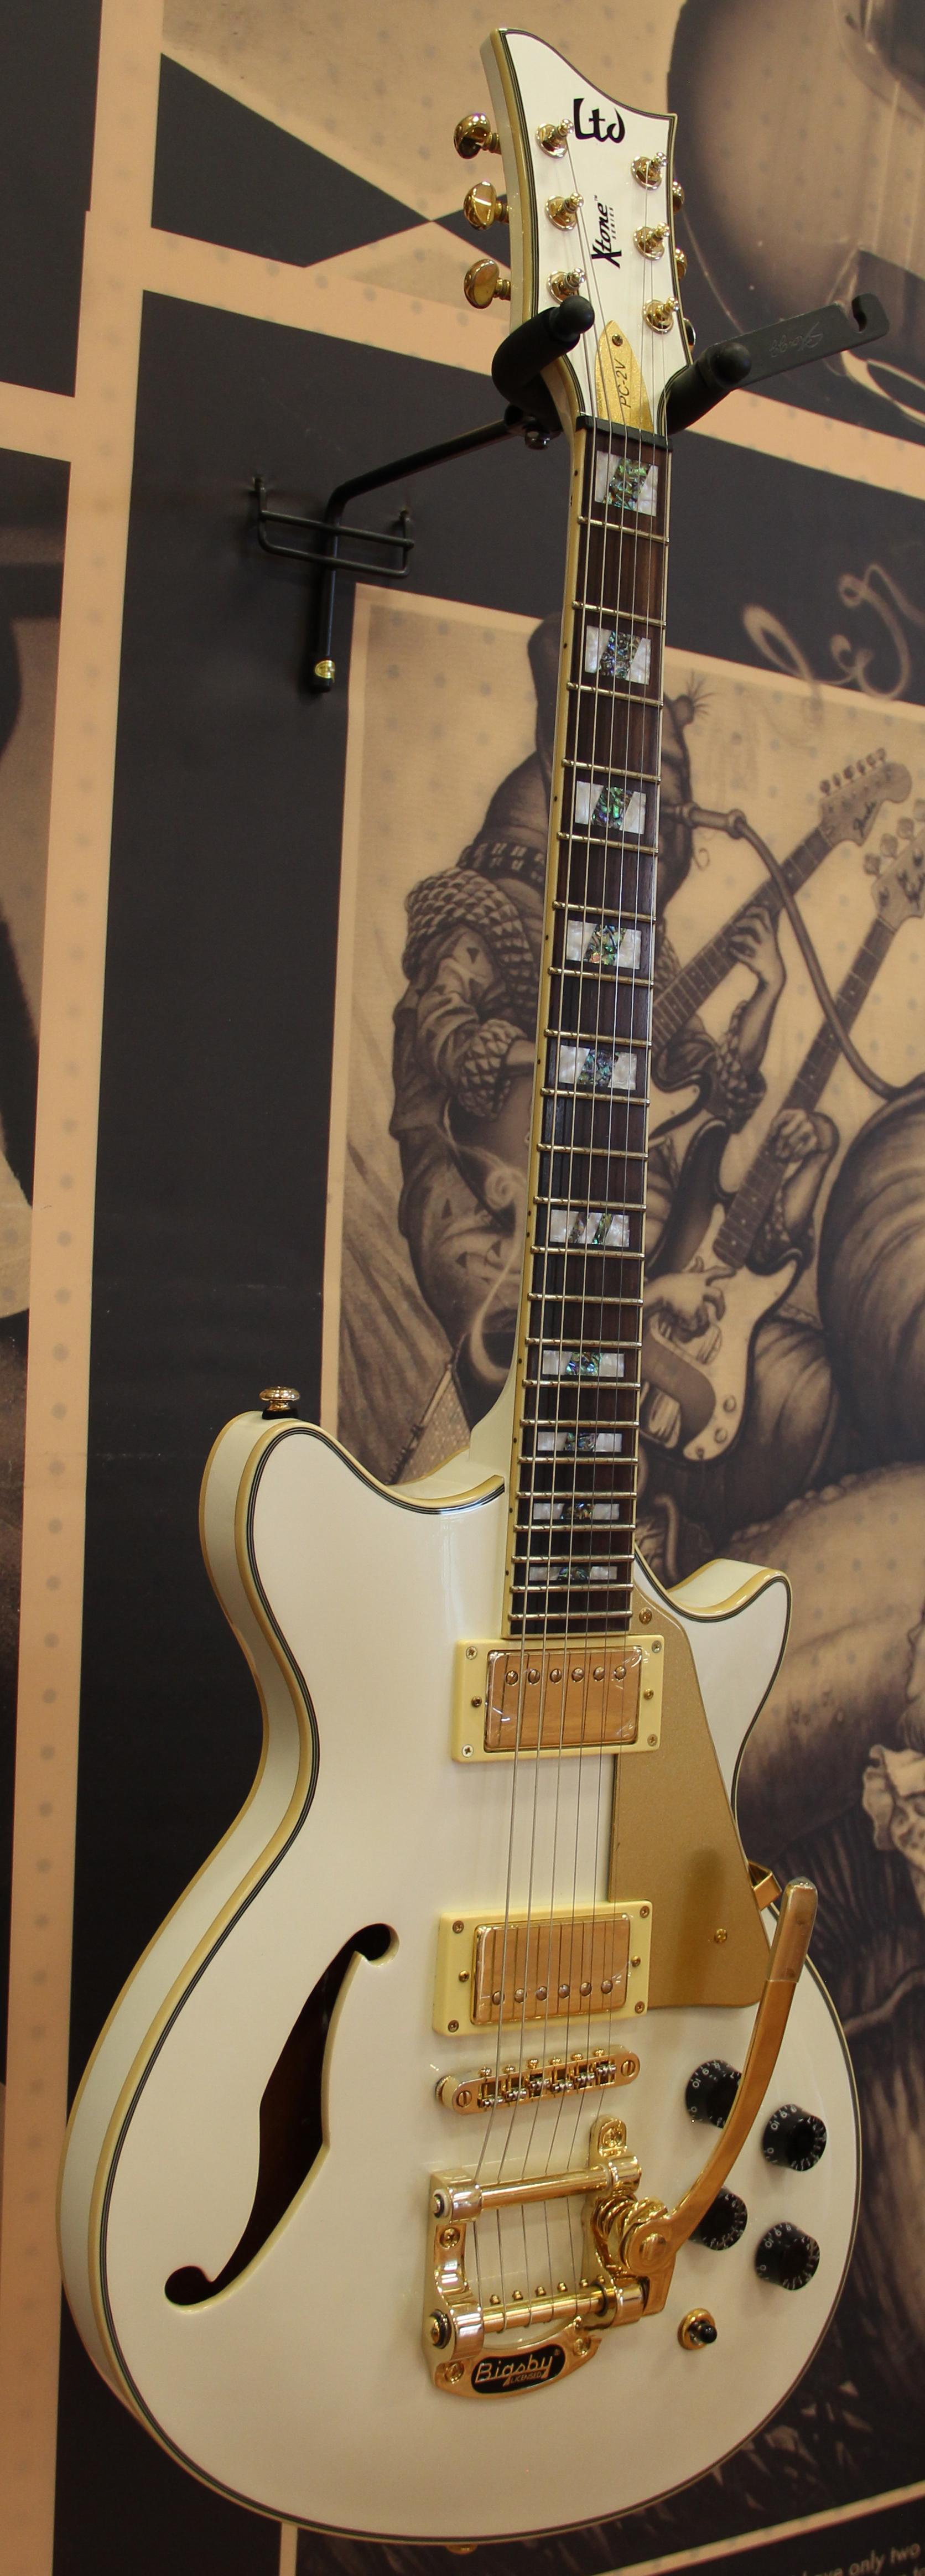 esp ltd xtone pc 2v electric guitar pearl white 840248017640 ebay. Black Bedroom Furniture Sets. Home Design Ideas